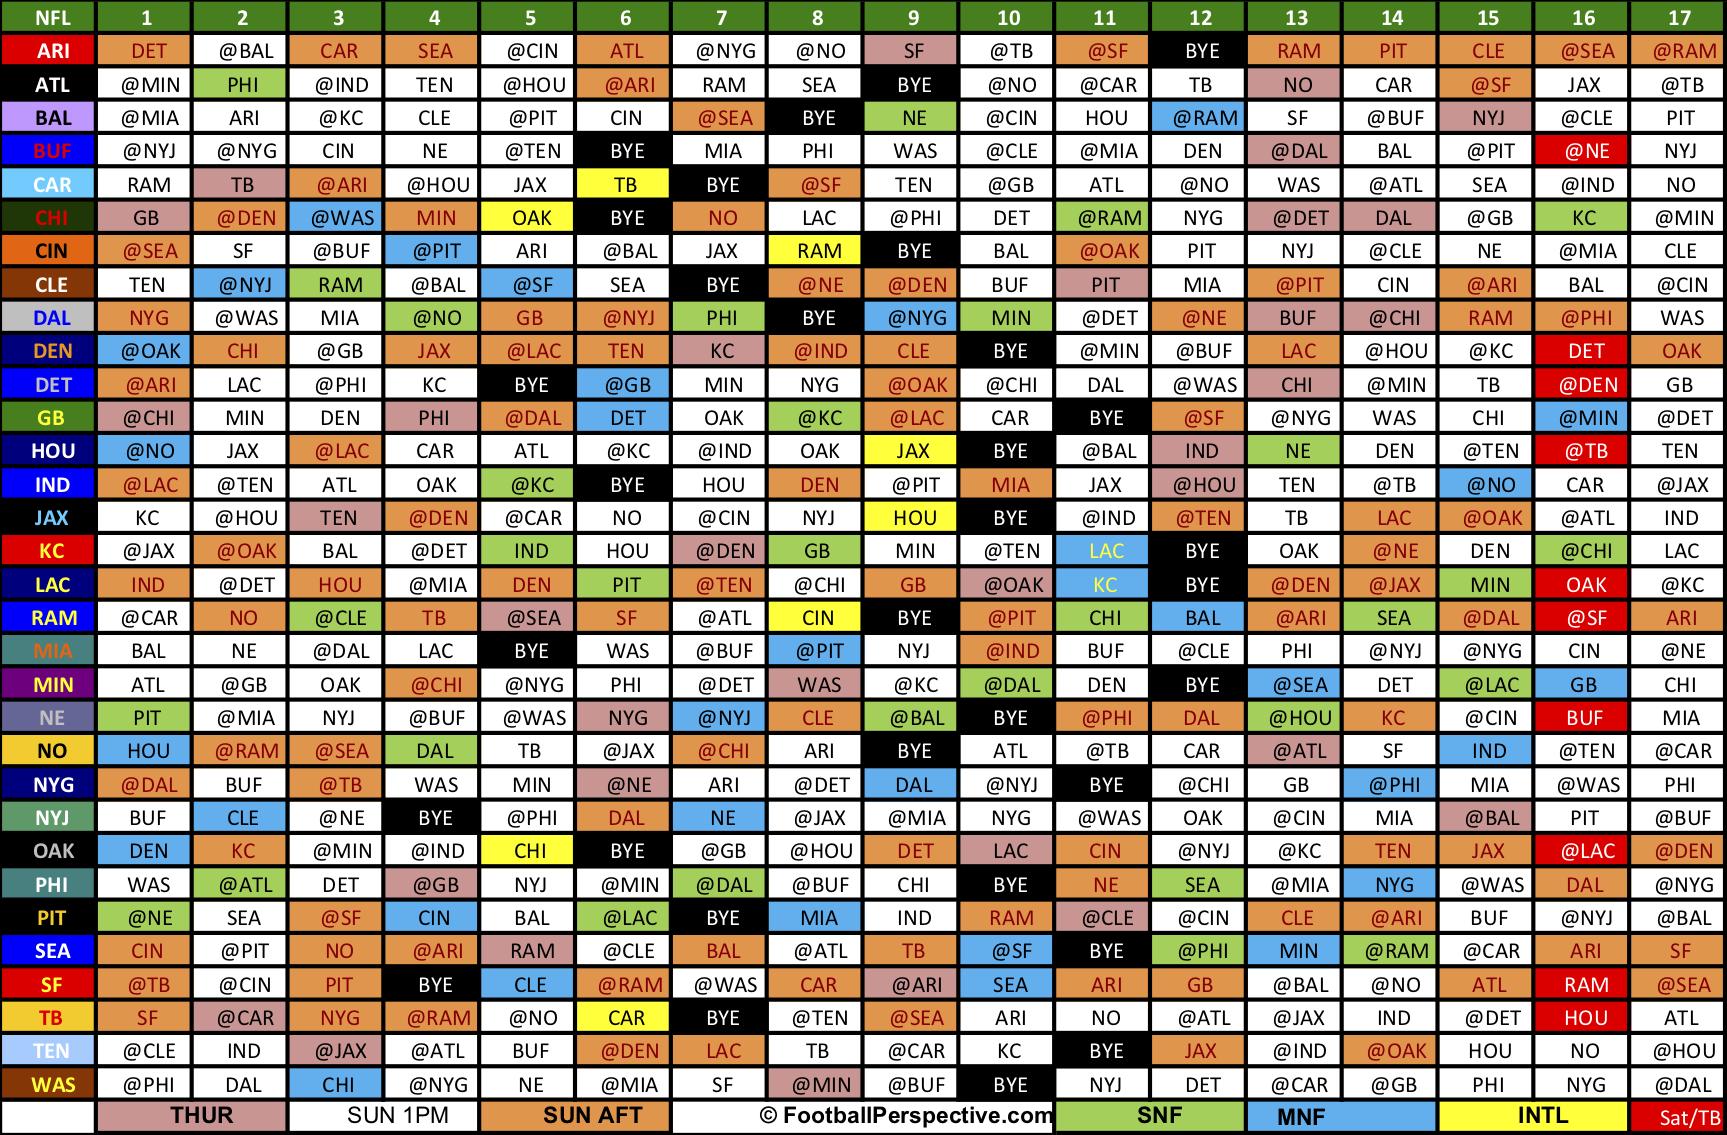 Catch Free Printable Nfl Schedule 2020 2020 | Calendar